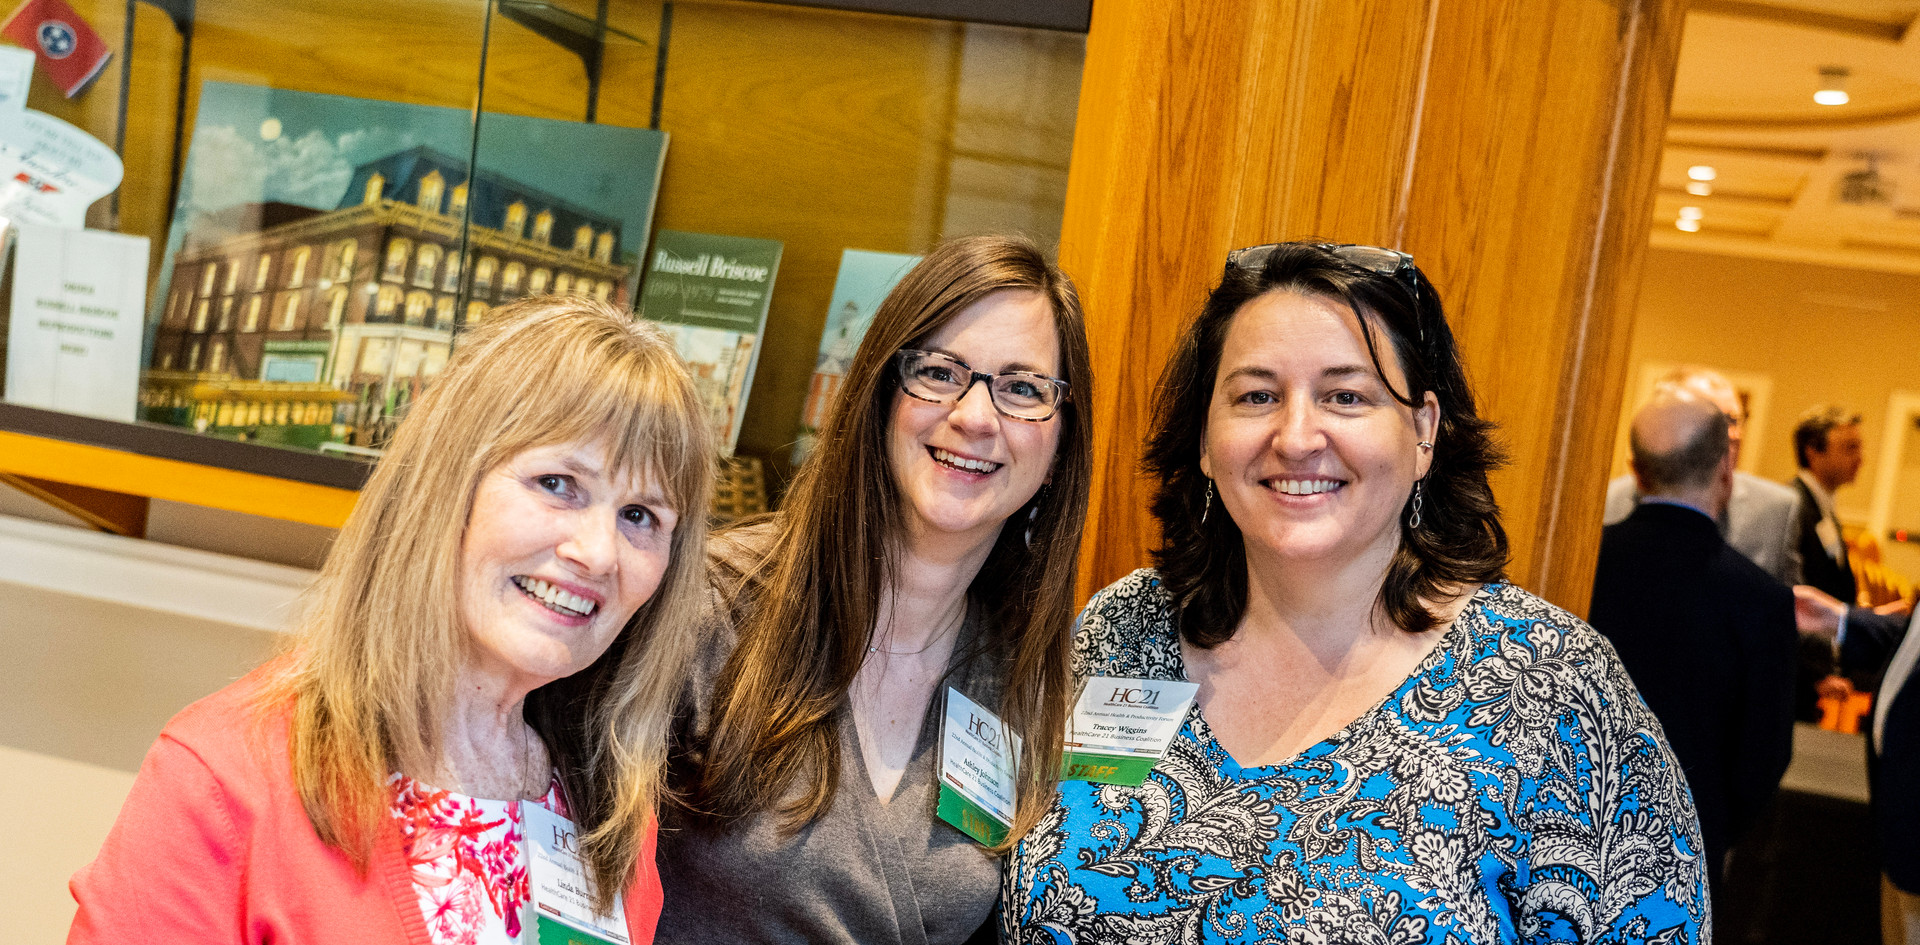 Linda Burnette, Ashley Johnson, and Tracey Wiggins